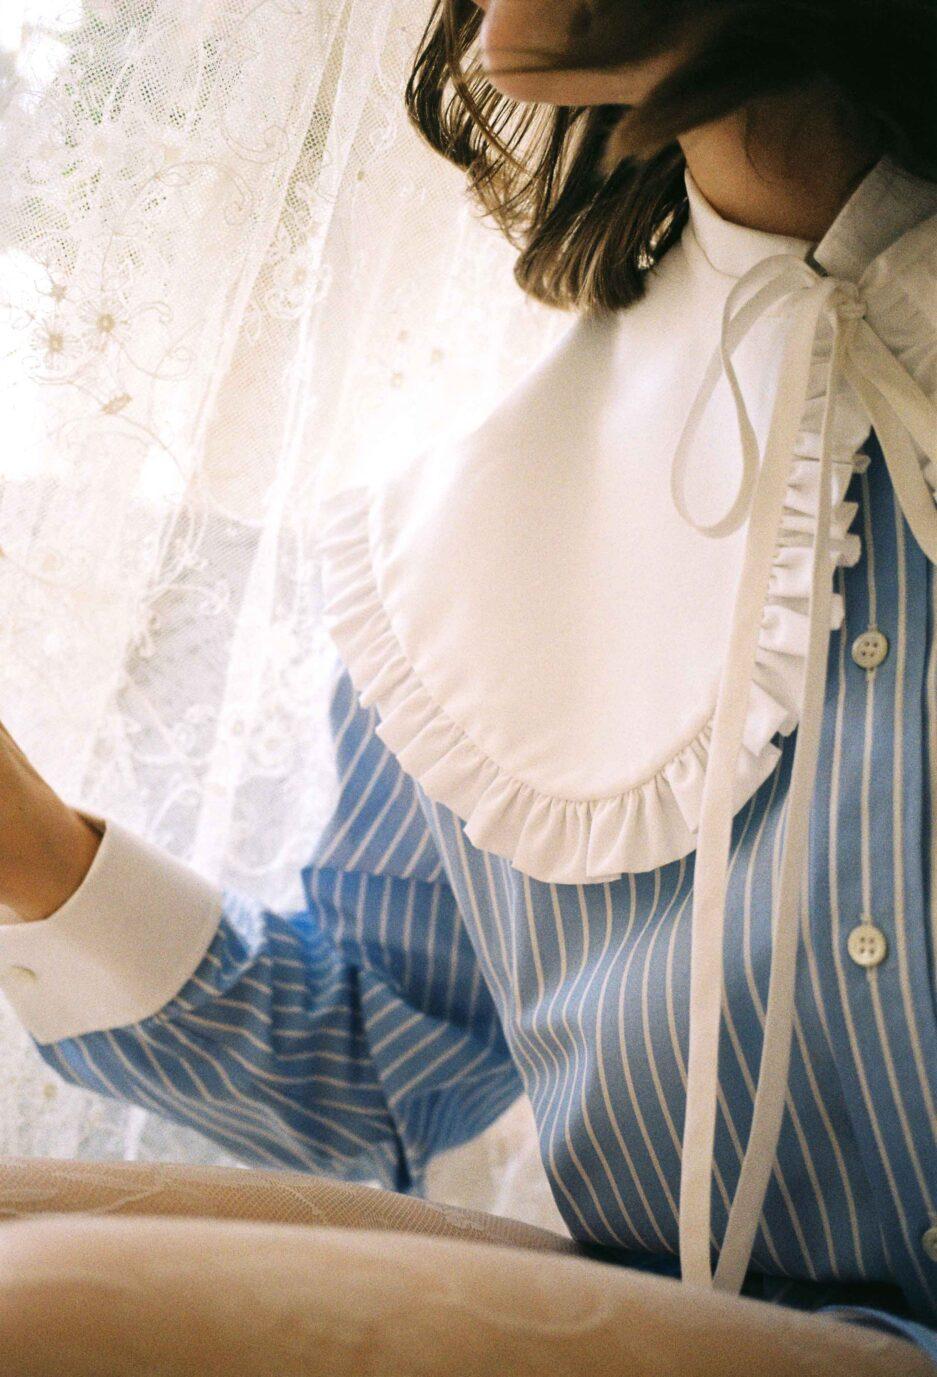 melampo-penny-collar-whit-ruffle-white-detail